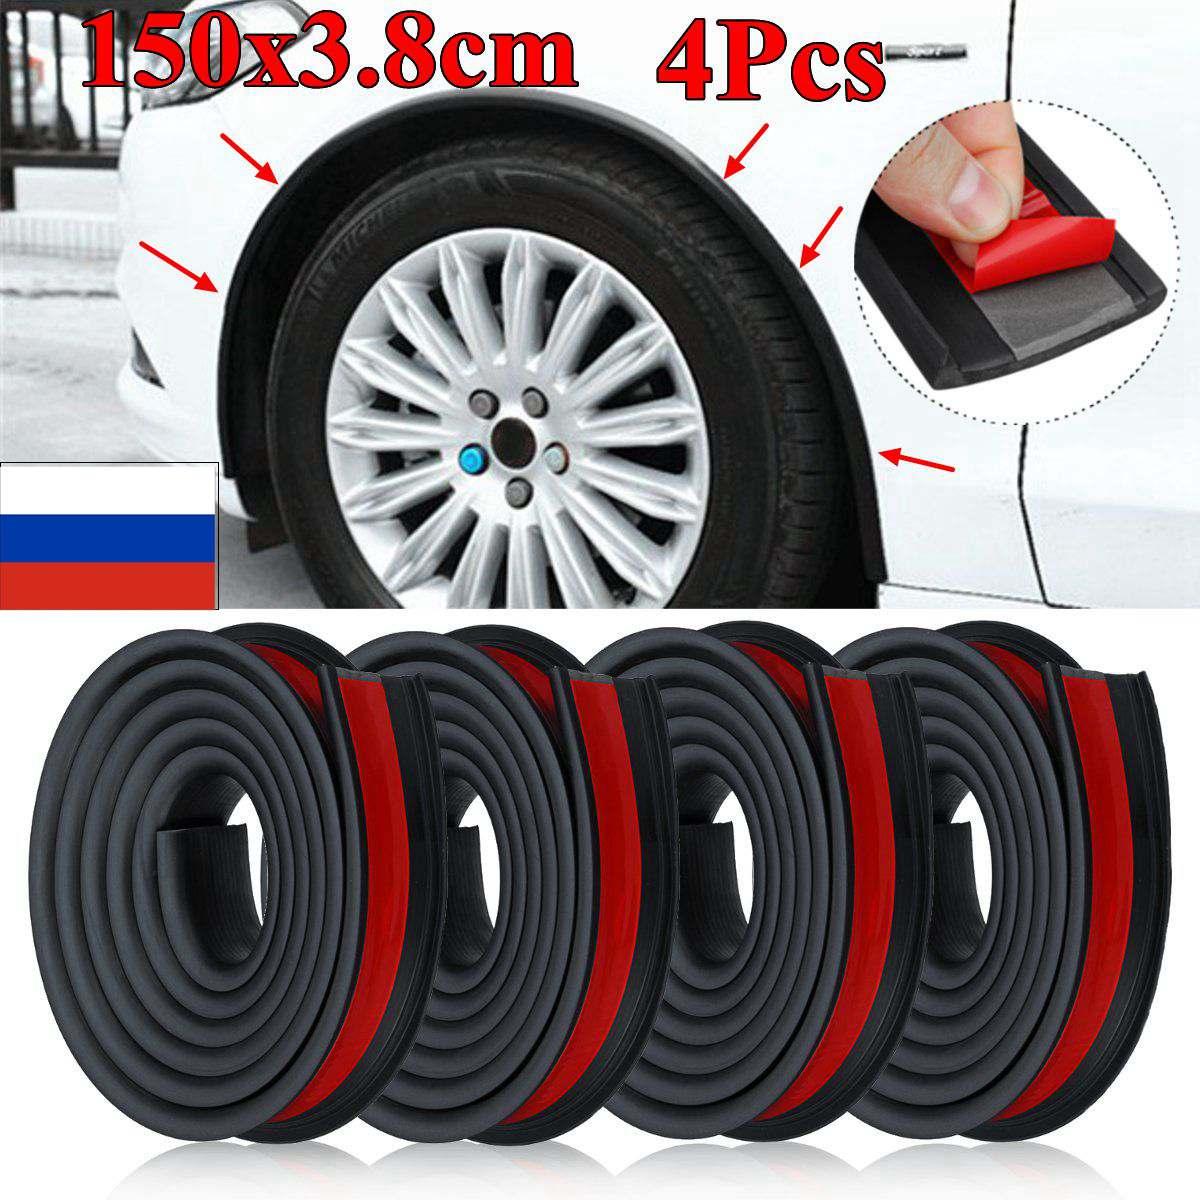 4pcs 1.5Mx3.8CM Universal Rubber Car Wheel Arch Protection Moldings Anti-collision Mudguard Car Wheel Protection Wheel Sticker